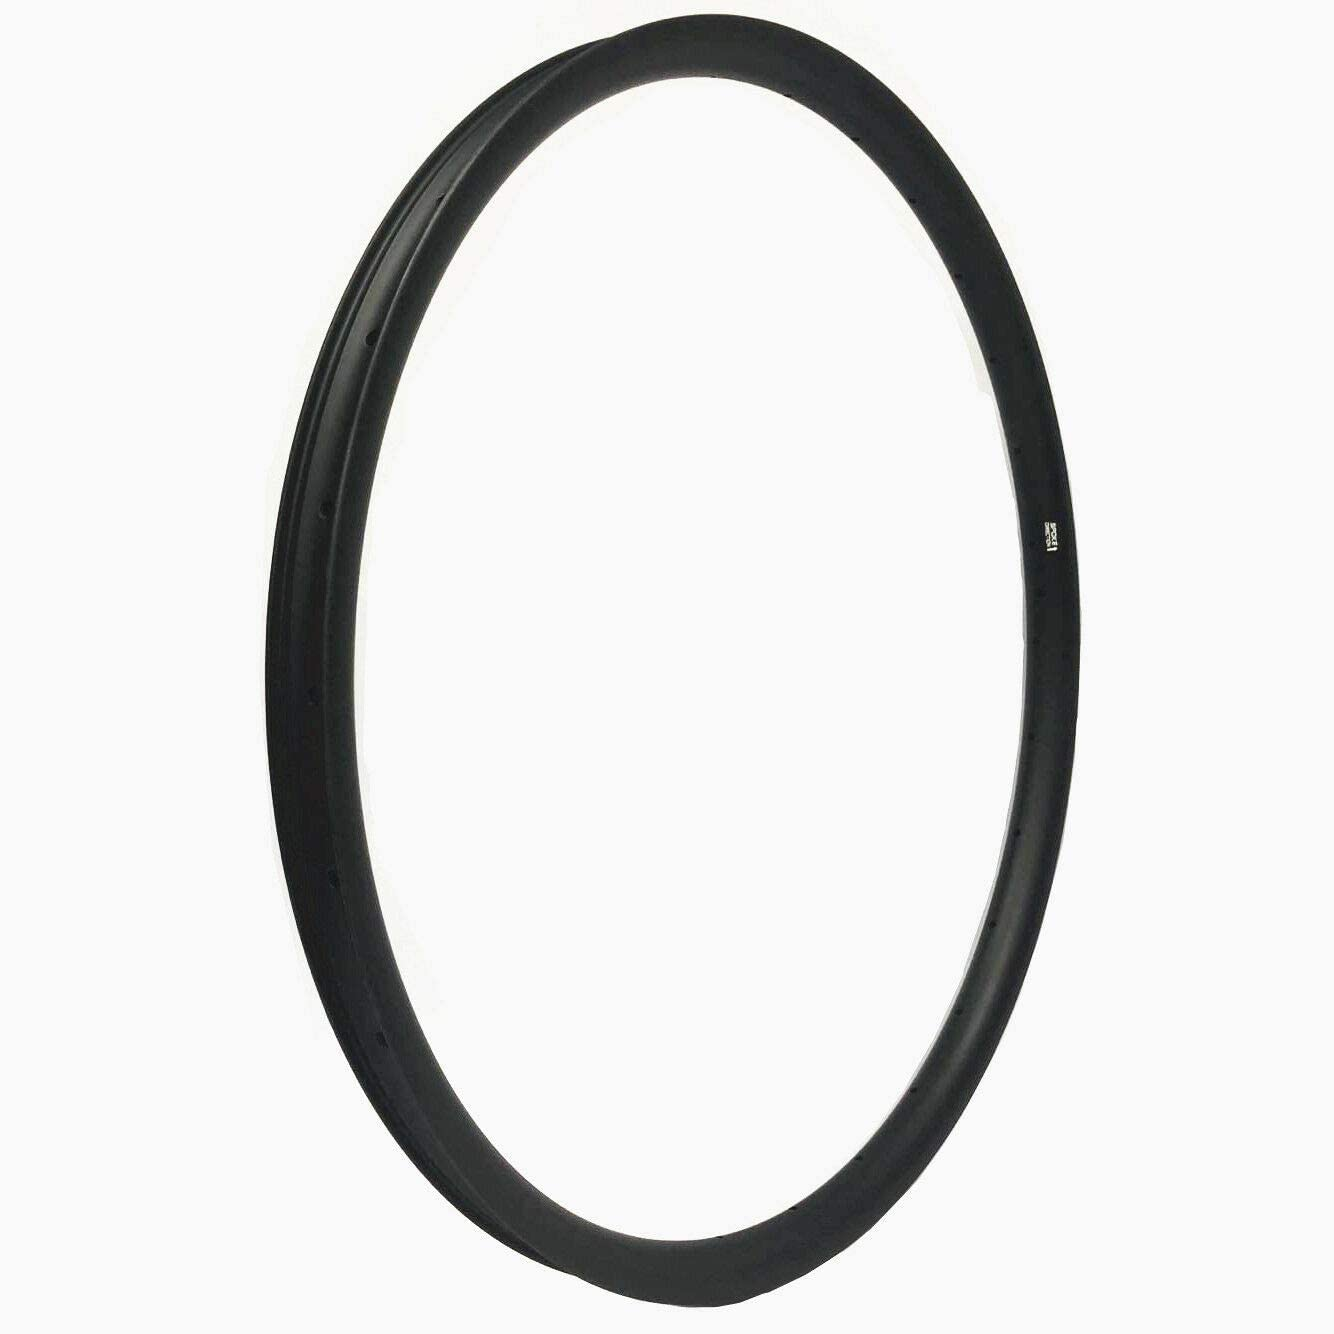 29 inch carbon MTB Rim tubeless compatible 50mm width mountain bike rim 32 hole